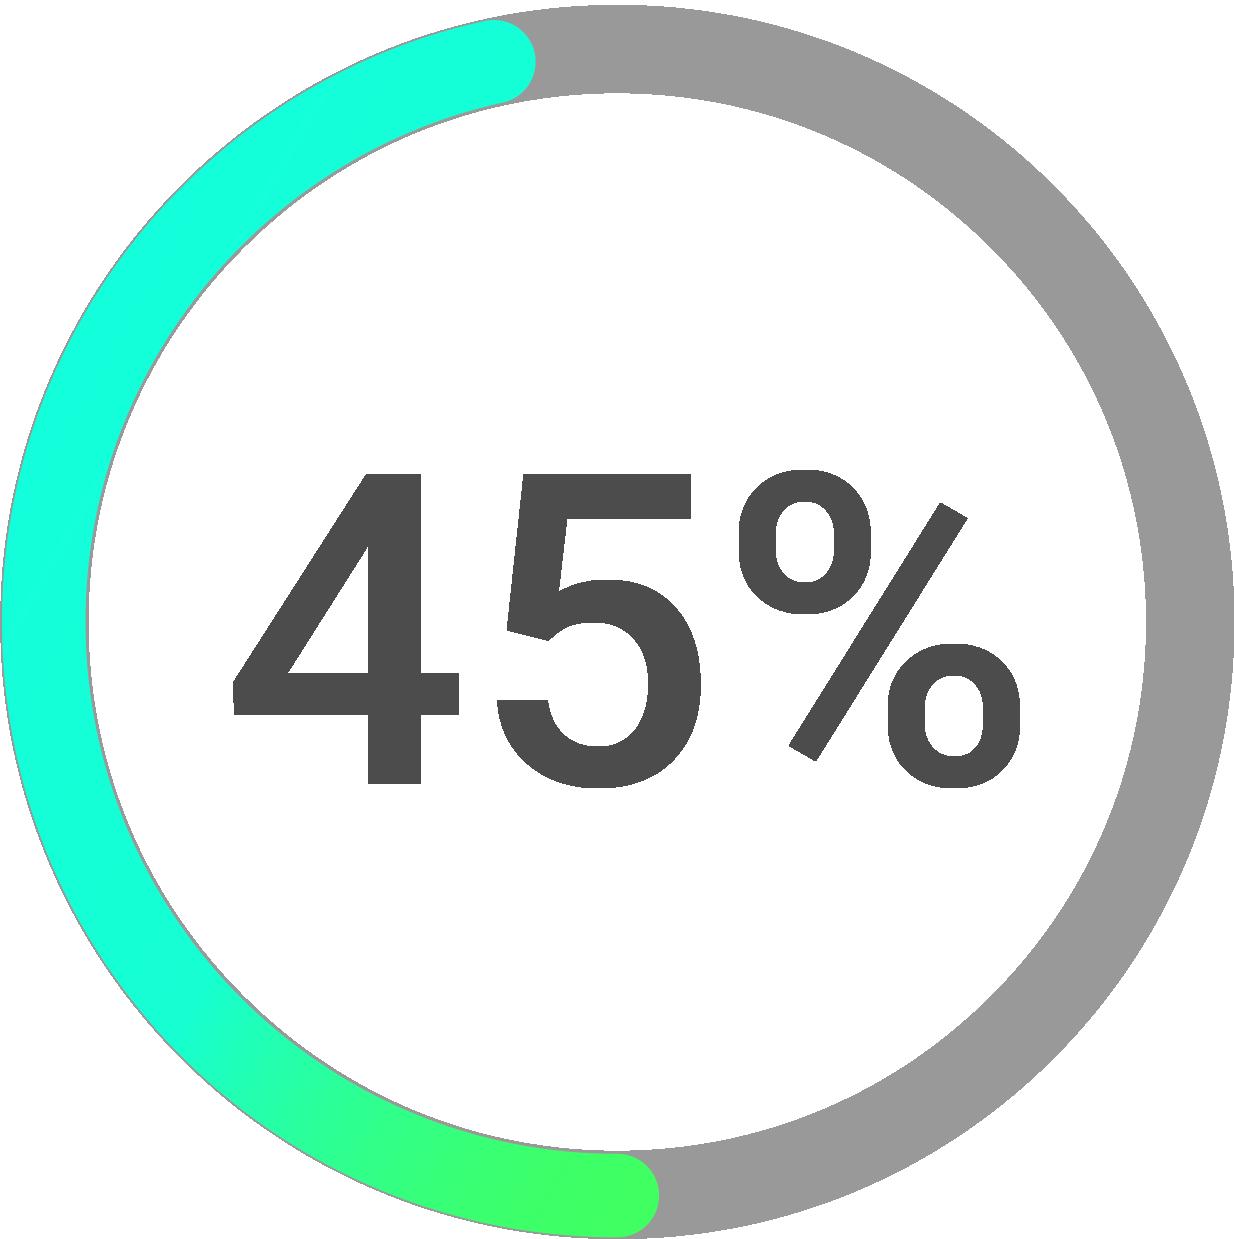 Circle progress icon percentage 45